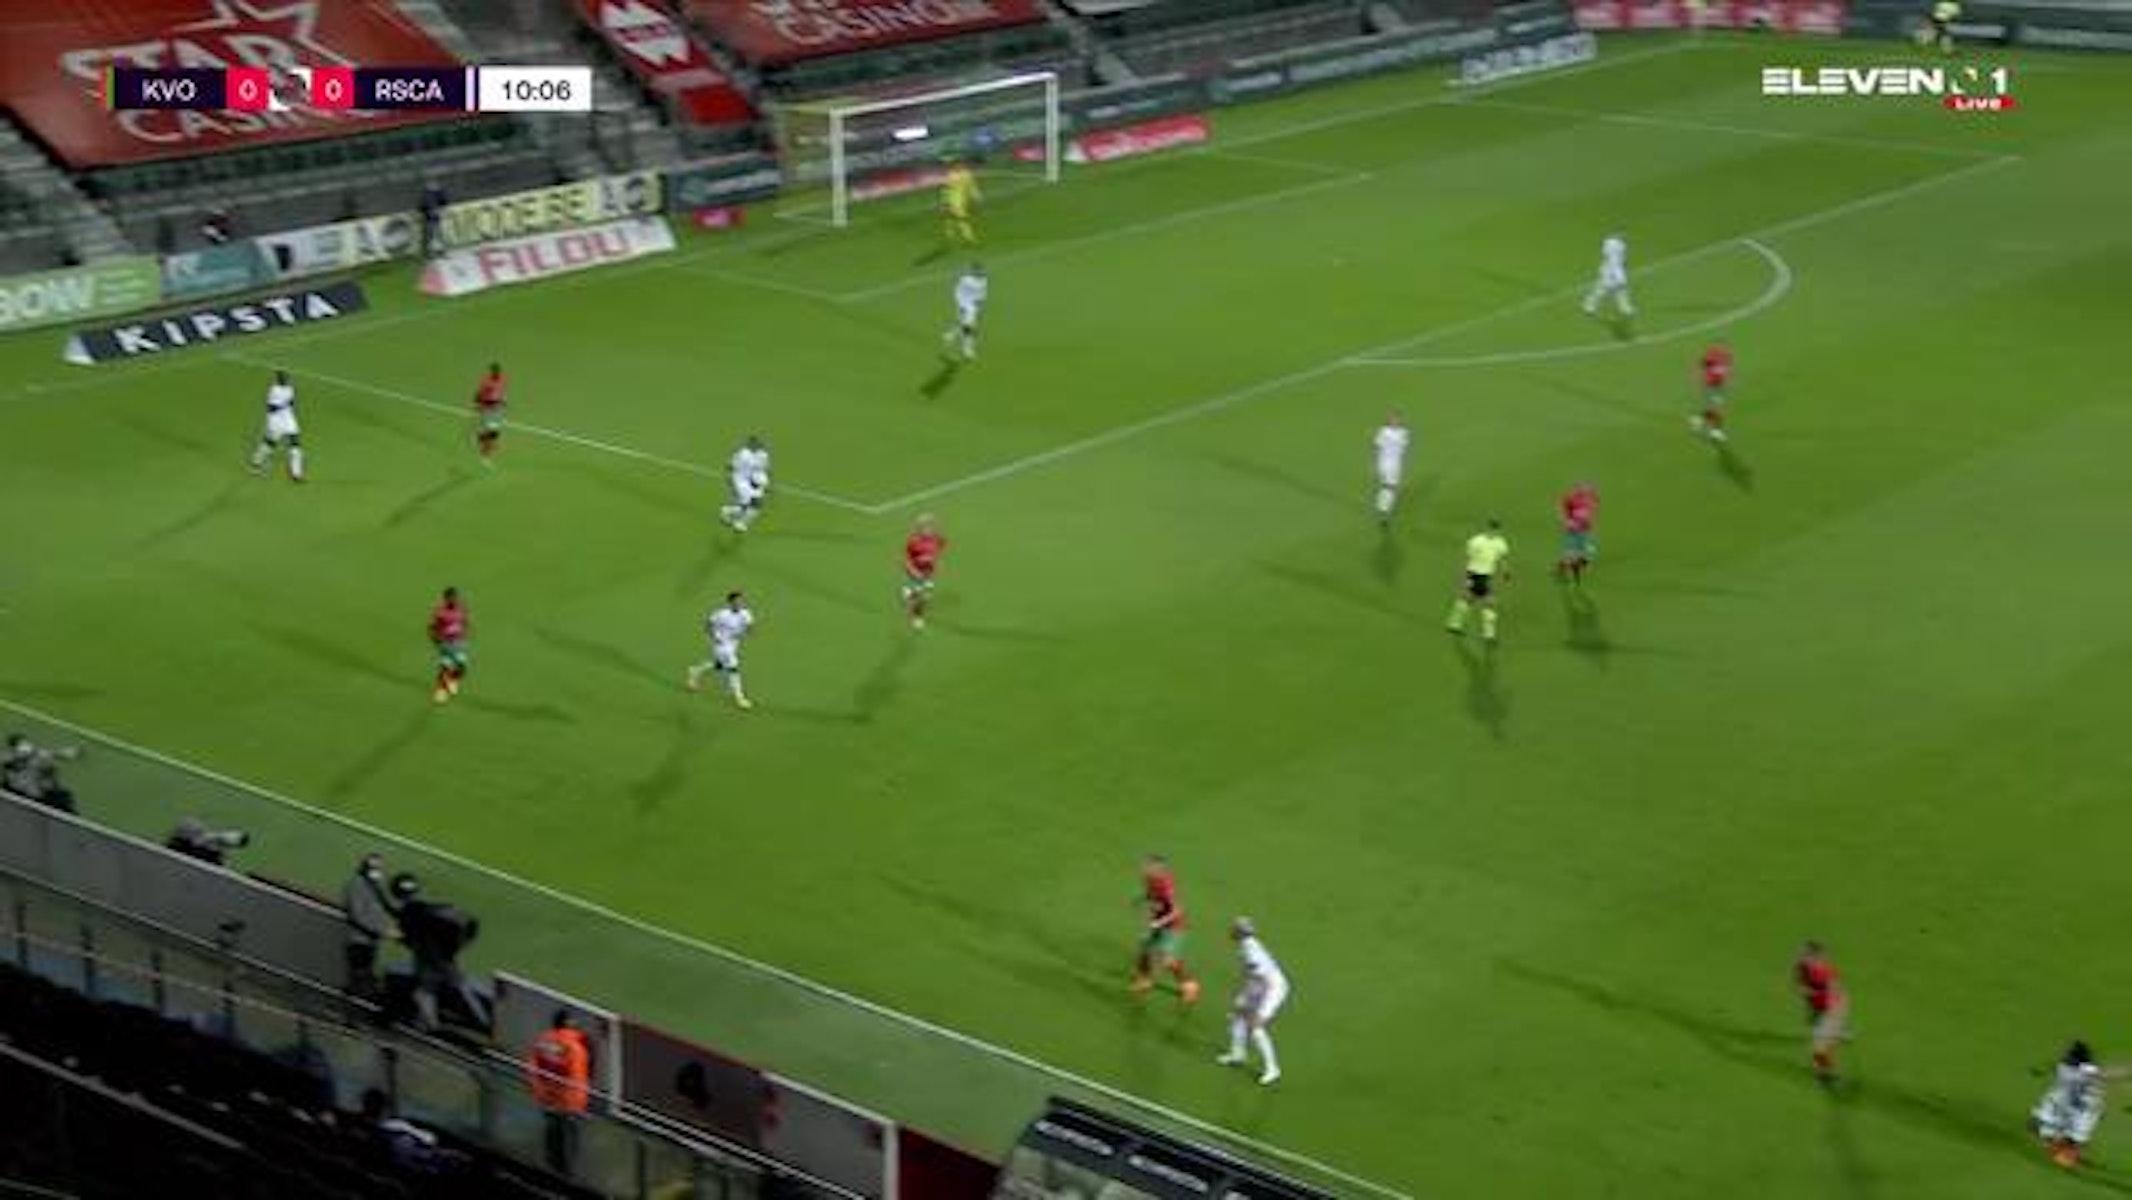 Doelpunt Robbie D'Haese (KV Oostende vs. RSC Anderlecht)